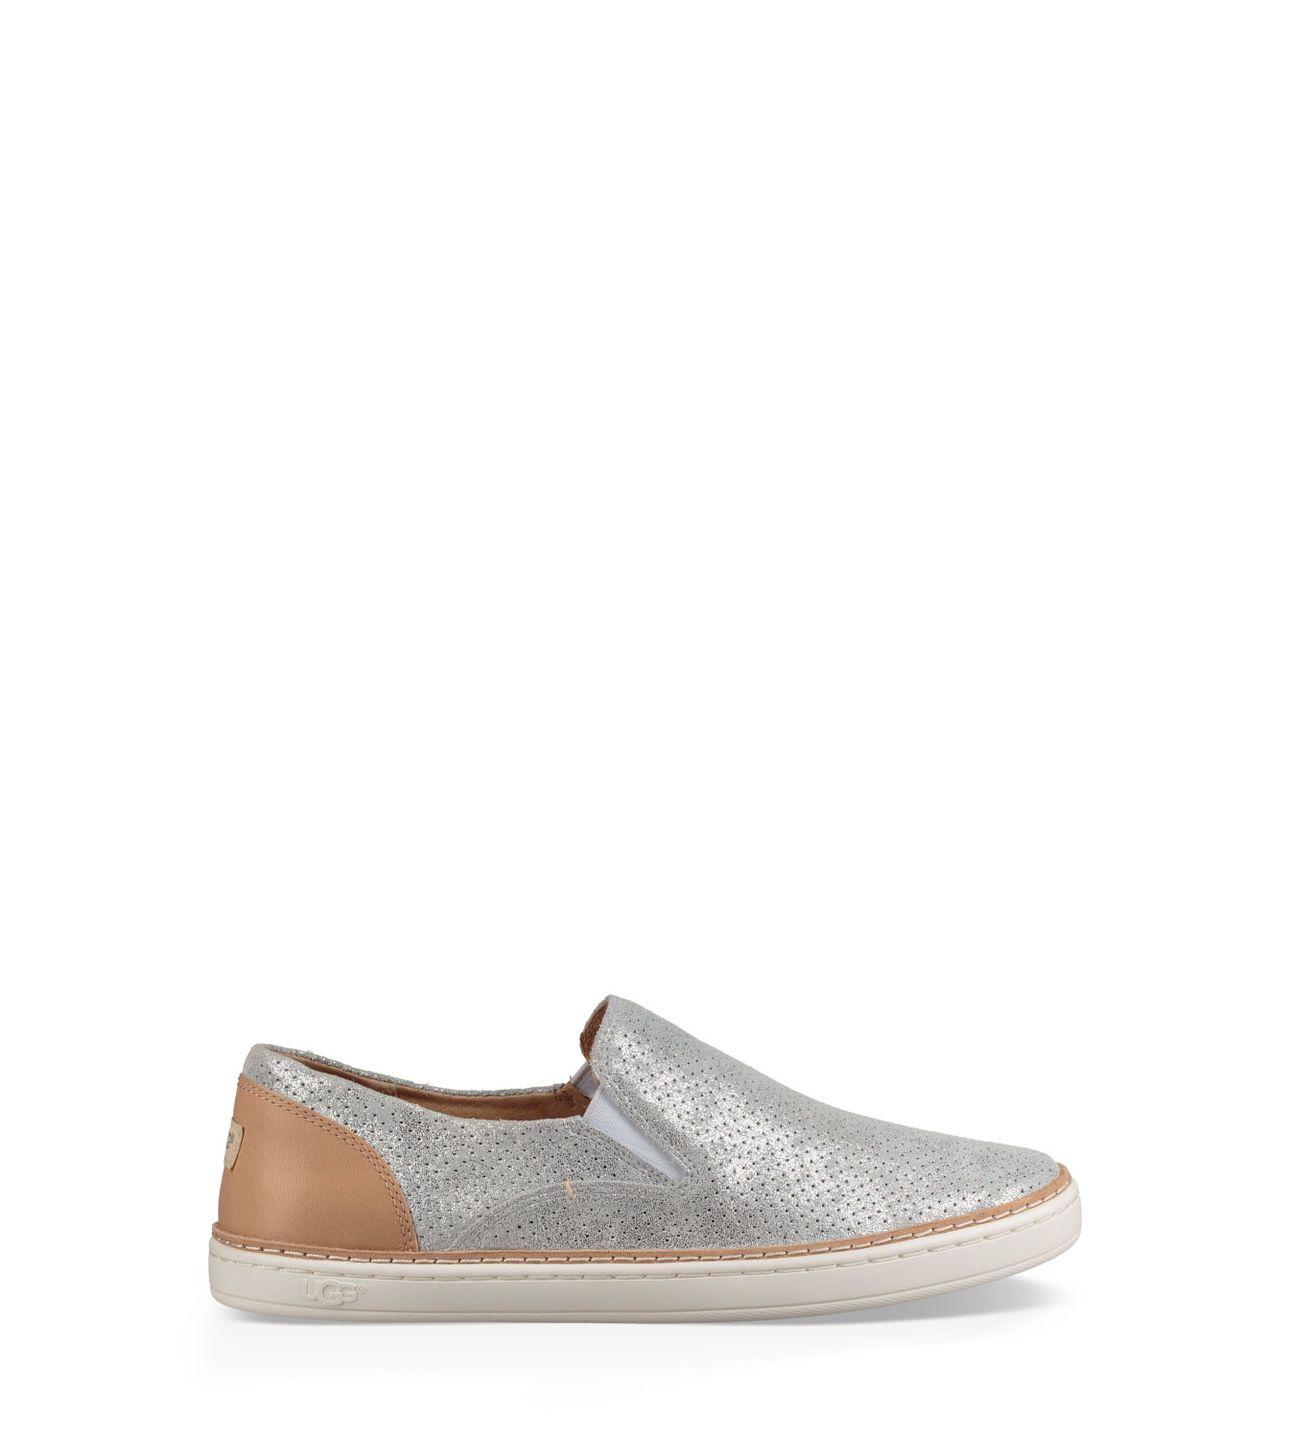 bc0b393700f9 Shop the Adley Perf Stardust Slip-On Shoe